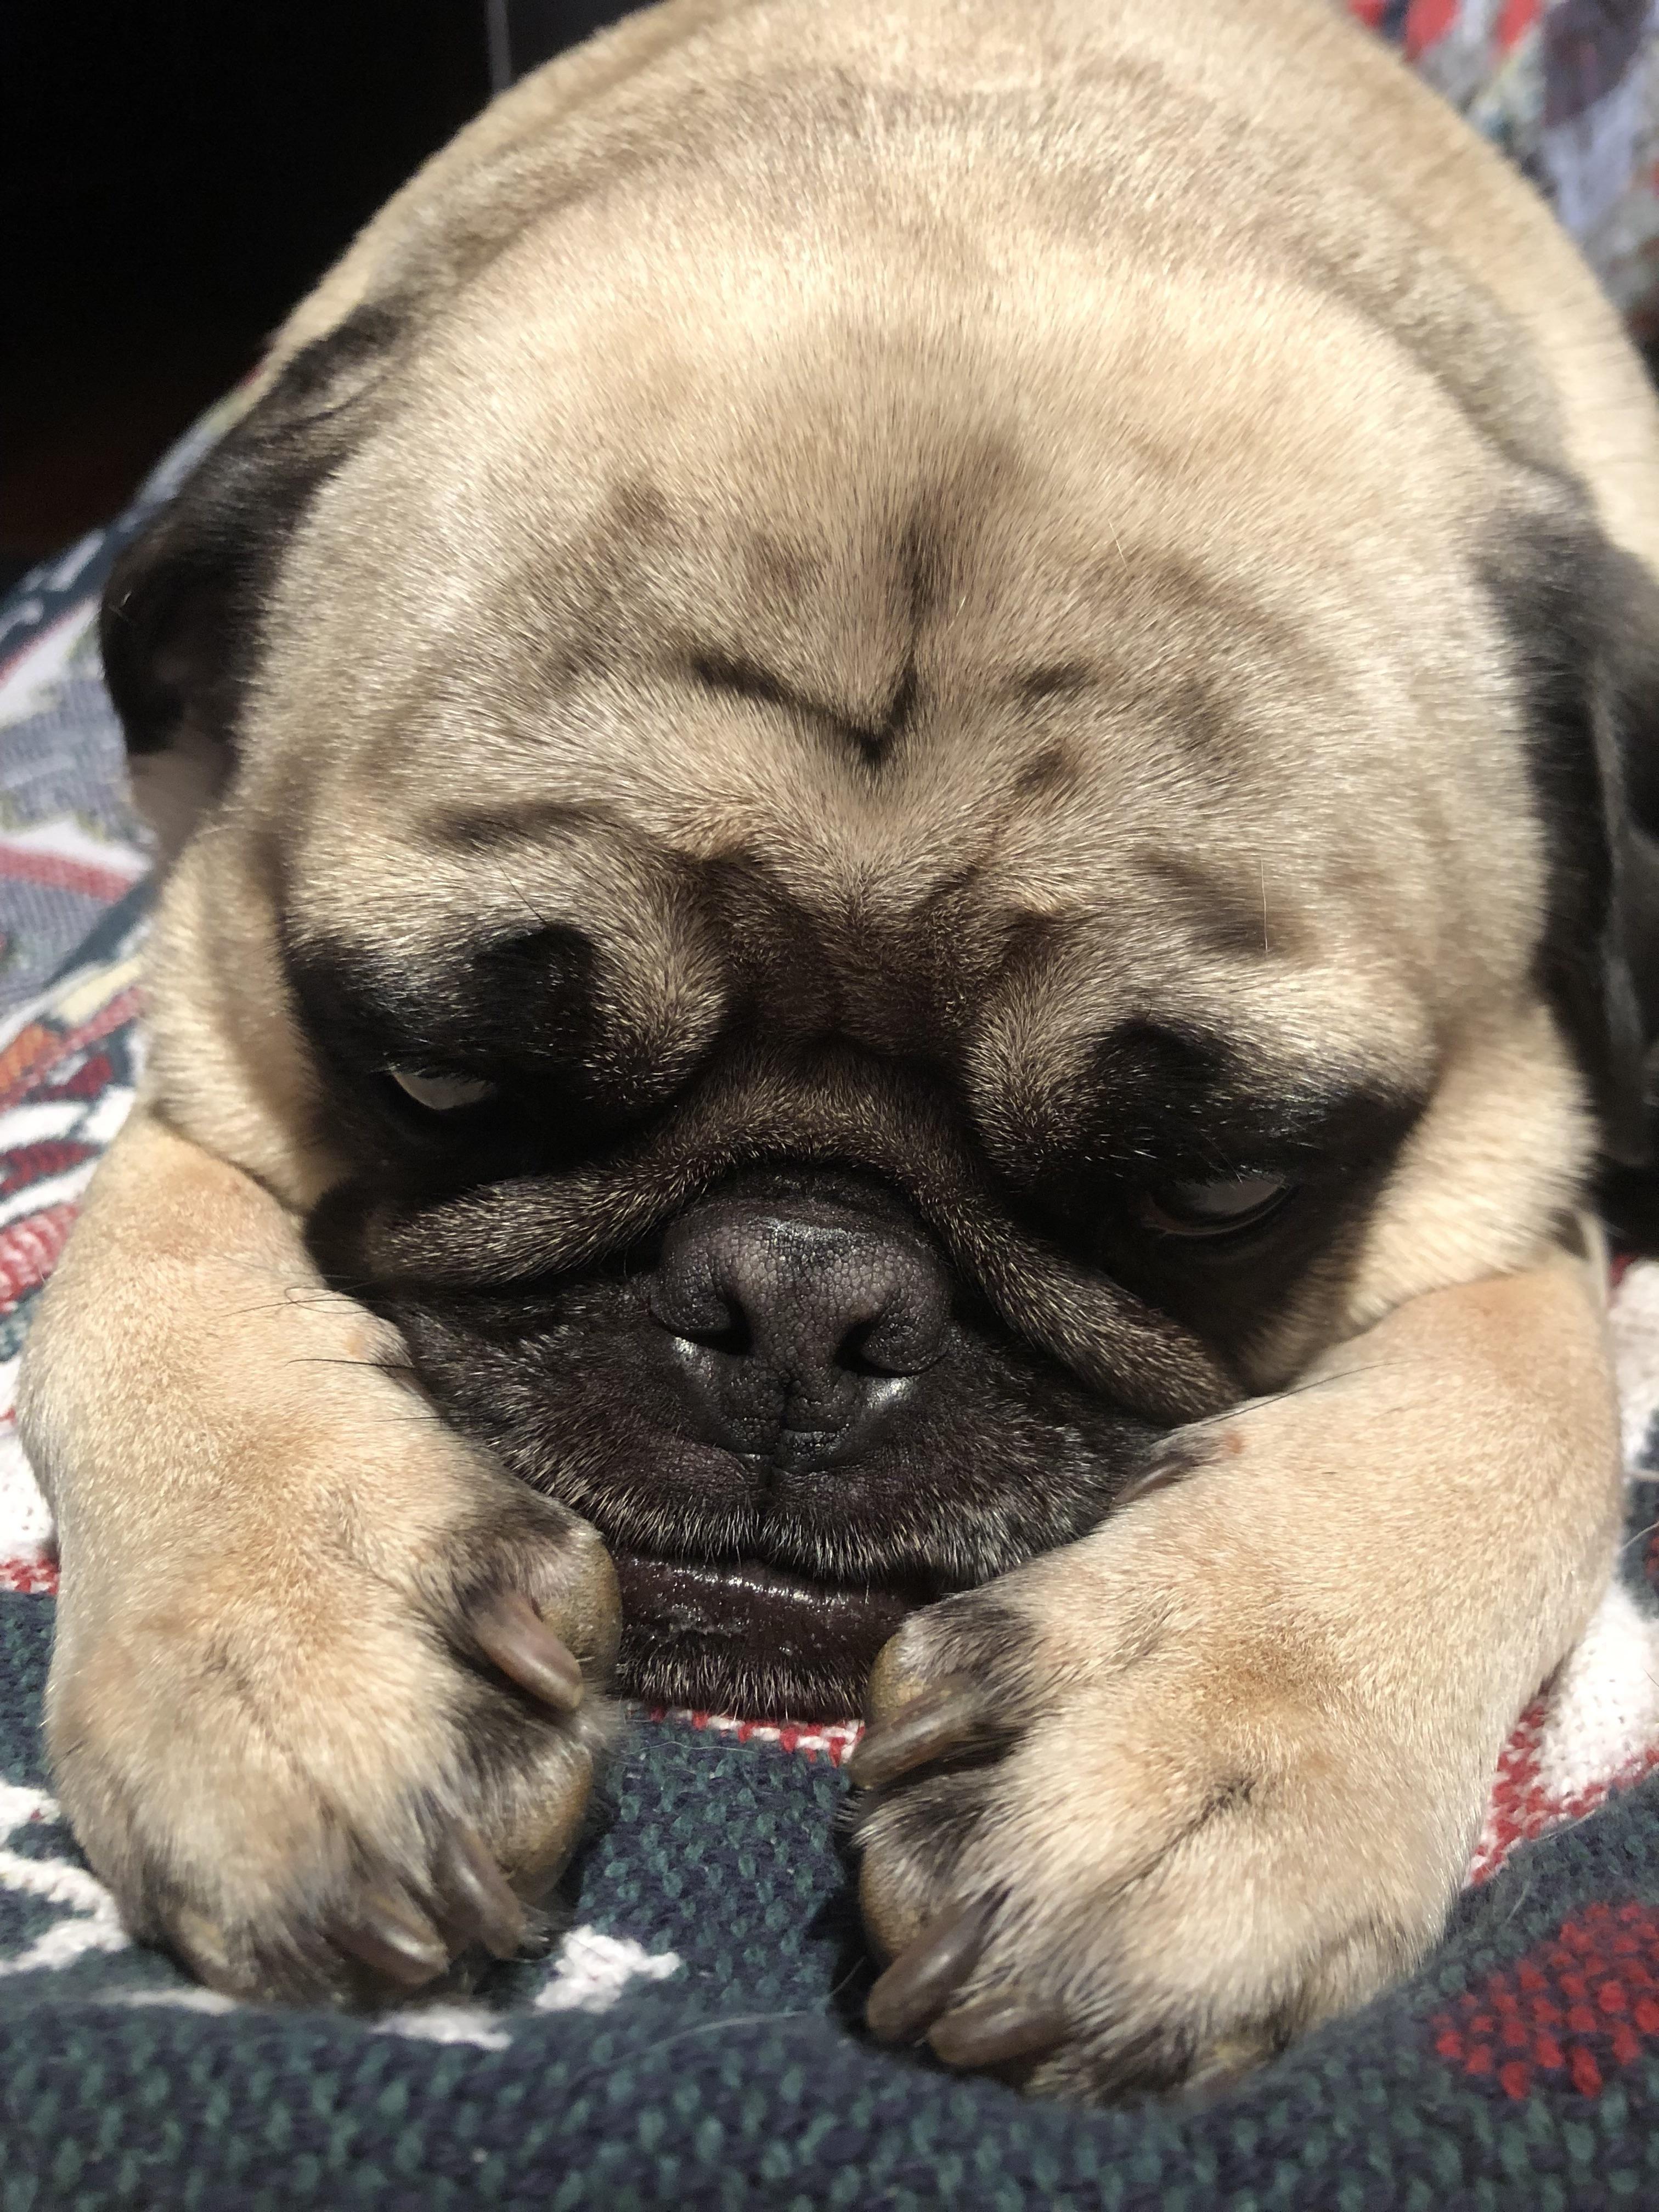 Ringo Was Soooo Tired Https Ift Tt 2d9ypth Pug Puppies Pugs